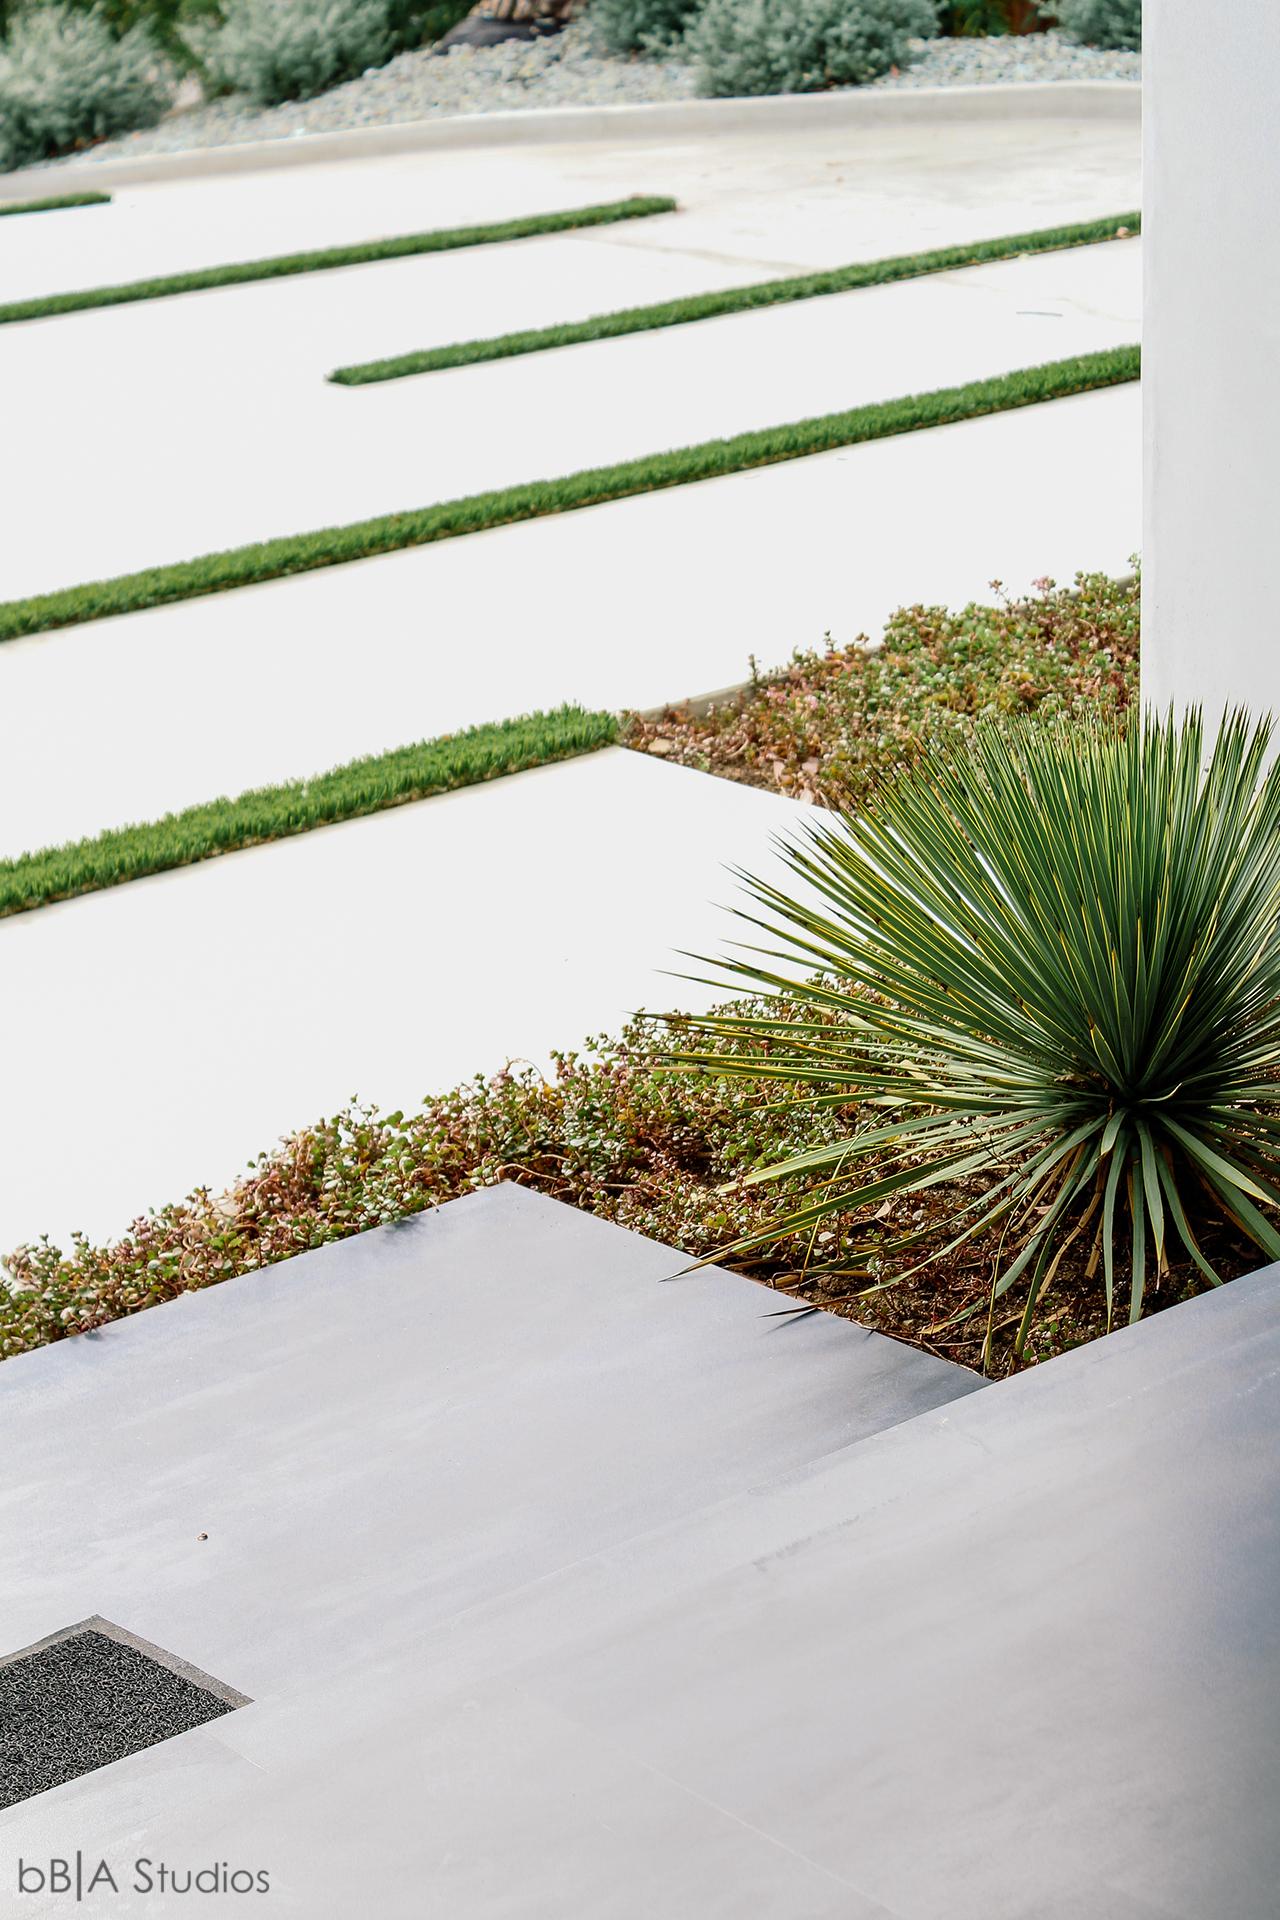 Detail of pavement plants